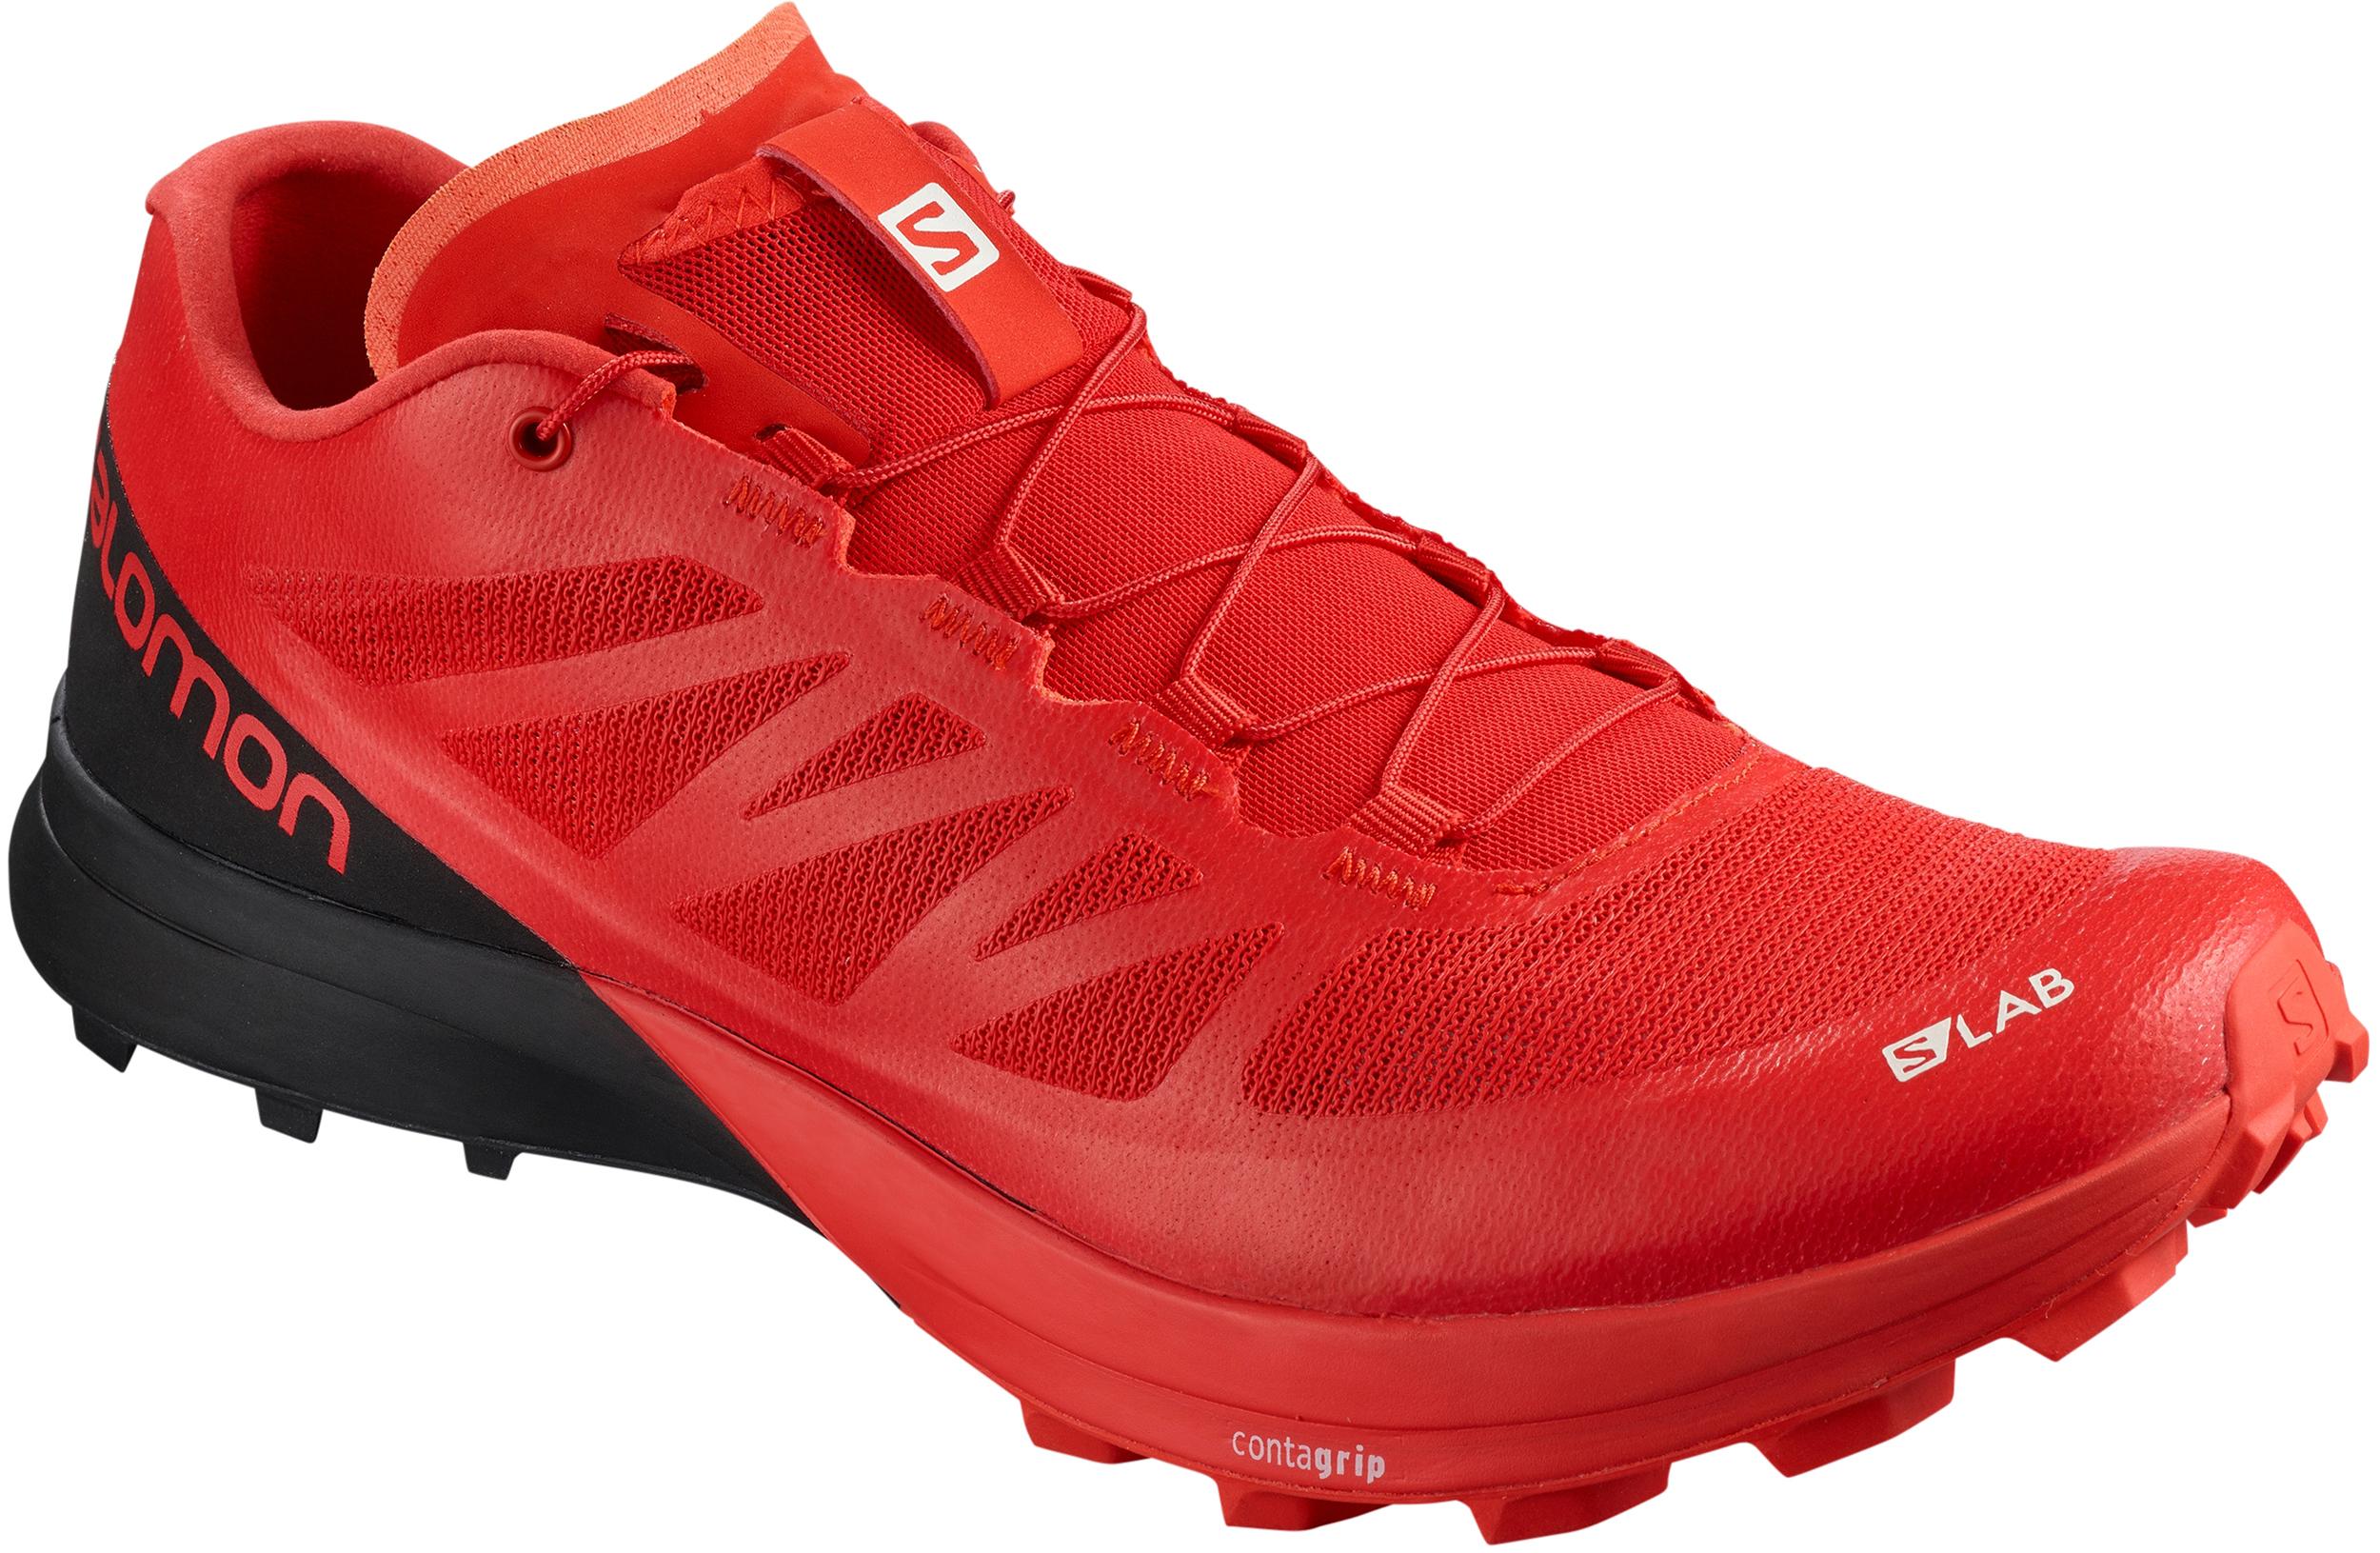 new arrival a265c 7024d Salomon S/LAB Sense 7 Soft Ground Trail Running Shoes - Unisex